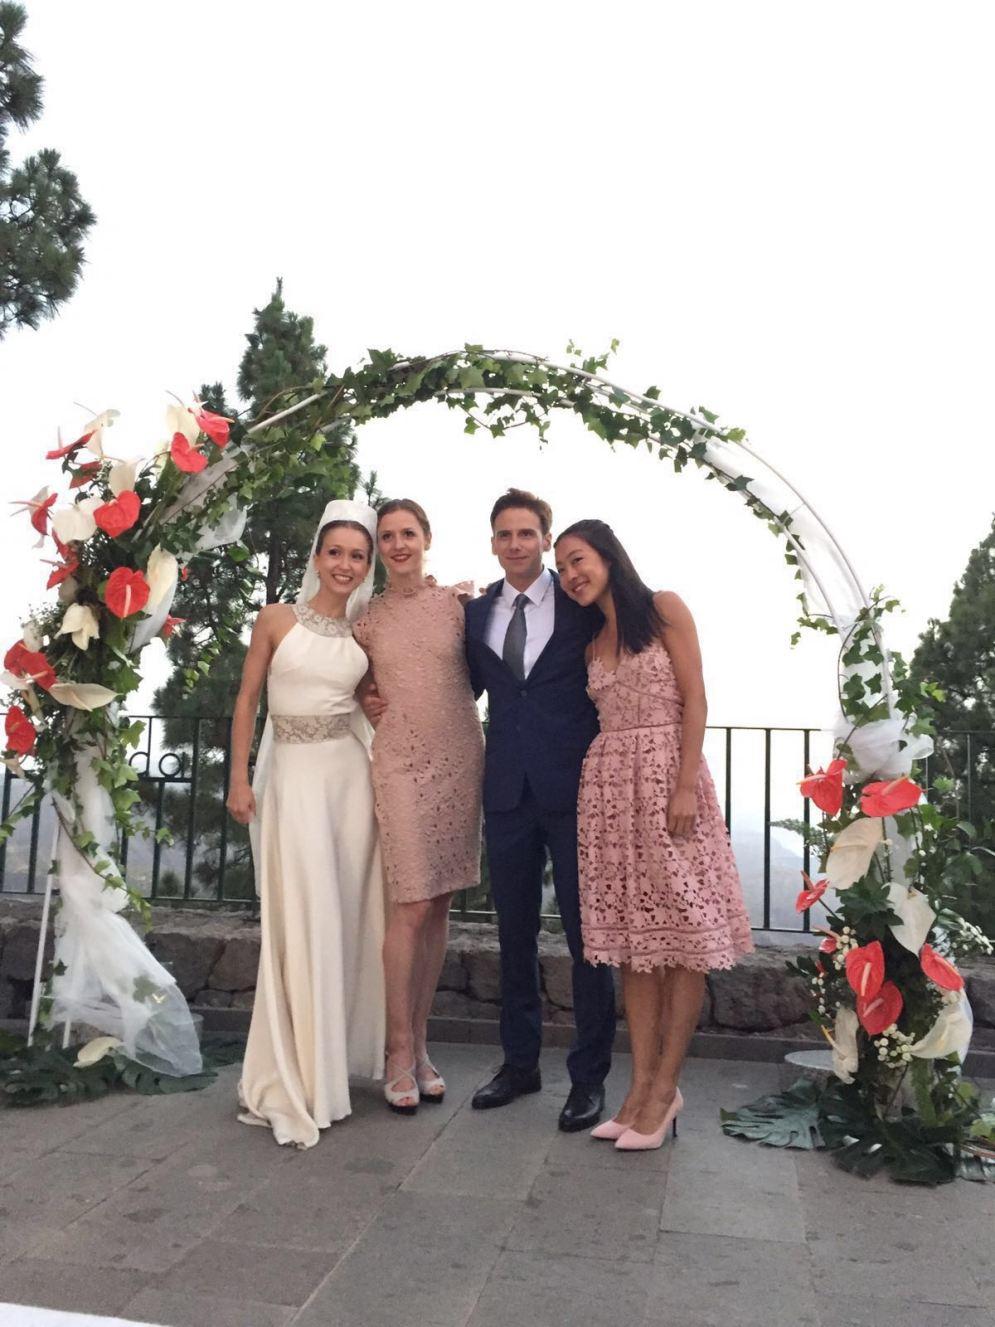 Xenia Wiest mit Weronika Frodyma, Xenias Bräutigam und Mari Kawanishi auf Gran Canaria.